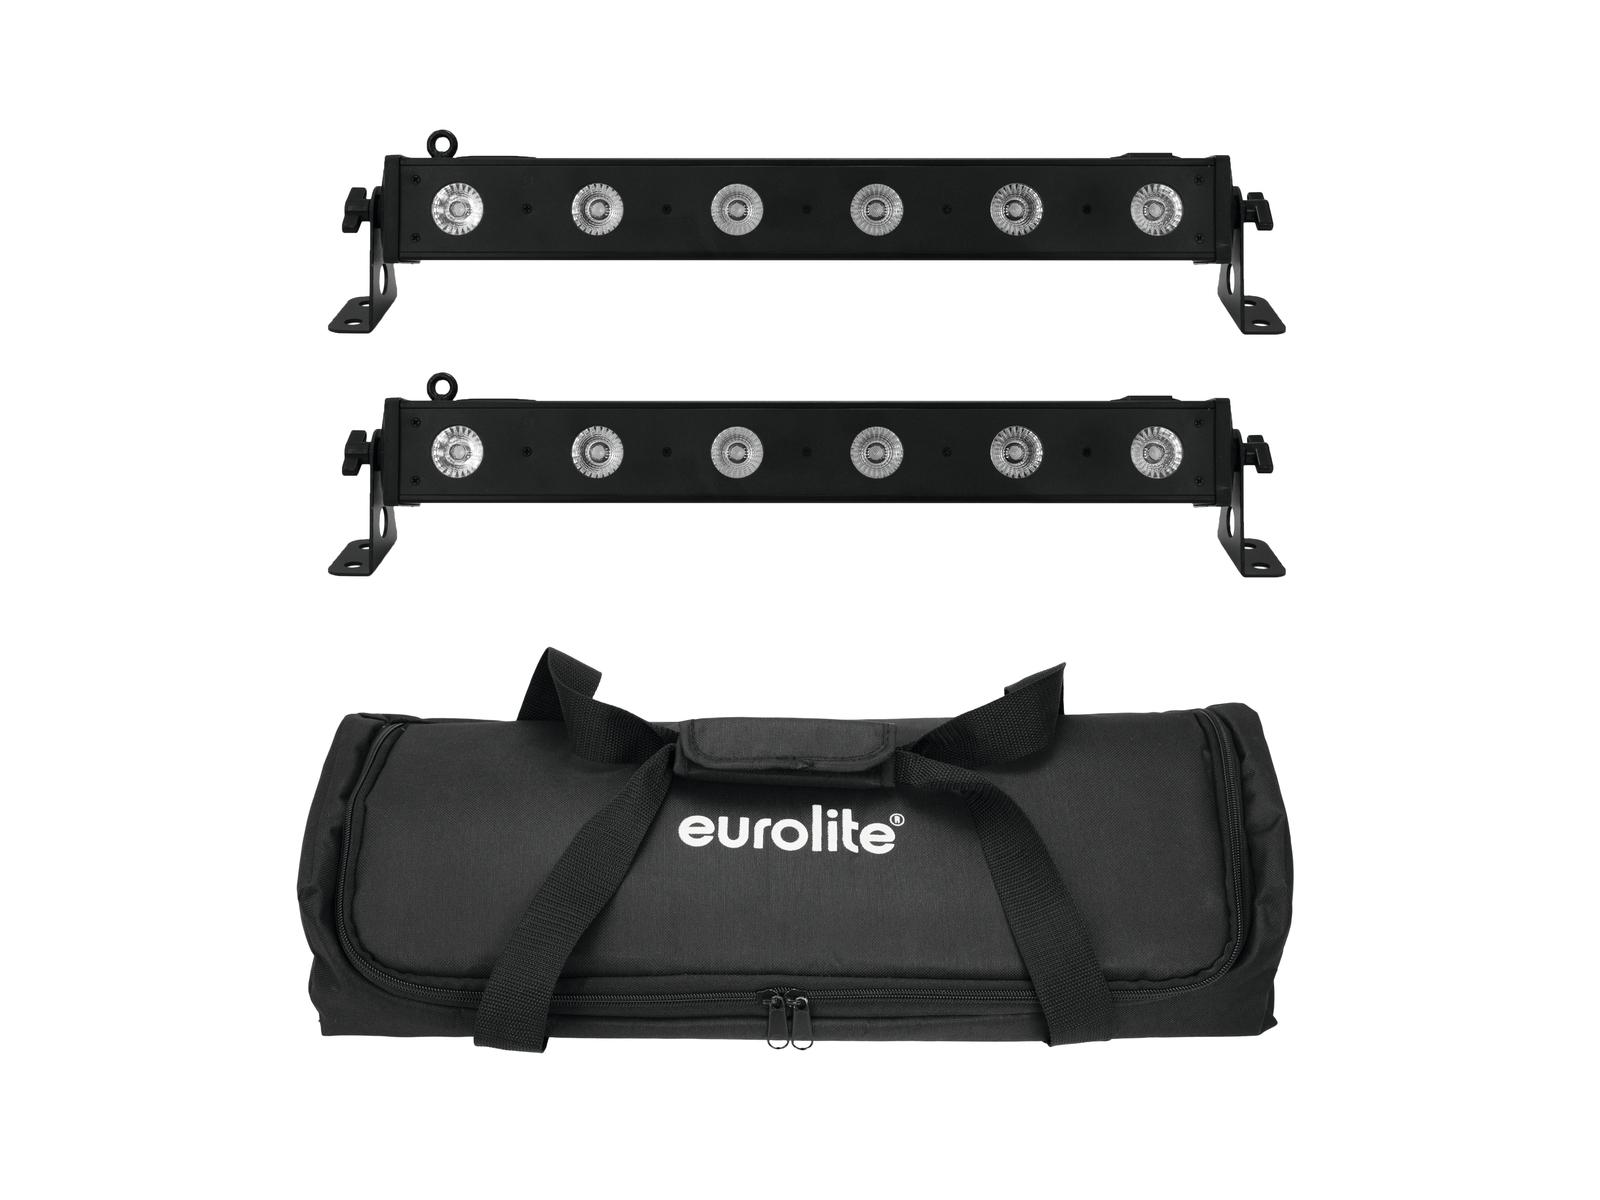 EUROLITE Set 2x LED BAR-6 QLC RGBW + Borsa Morbida